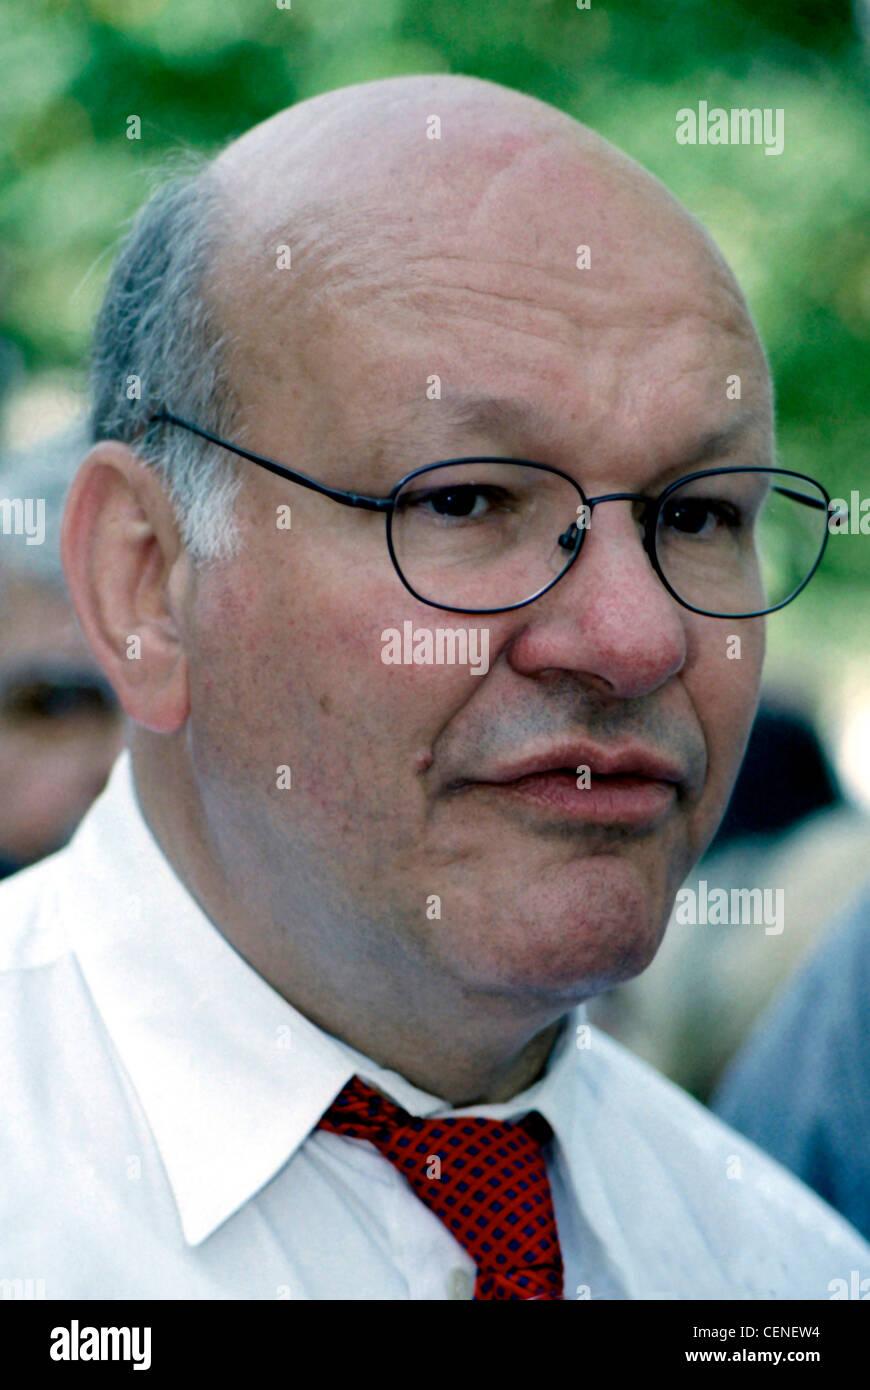 Walter Momper - *21.02.1945: Portrait of the social-democratic politician and Mayor of Berlin 1989 – 1991. - Stock Image